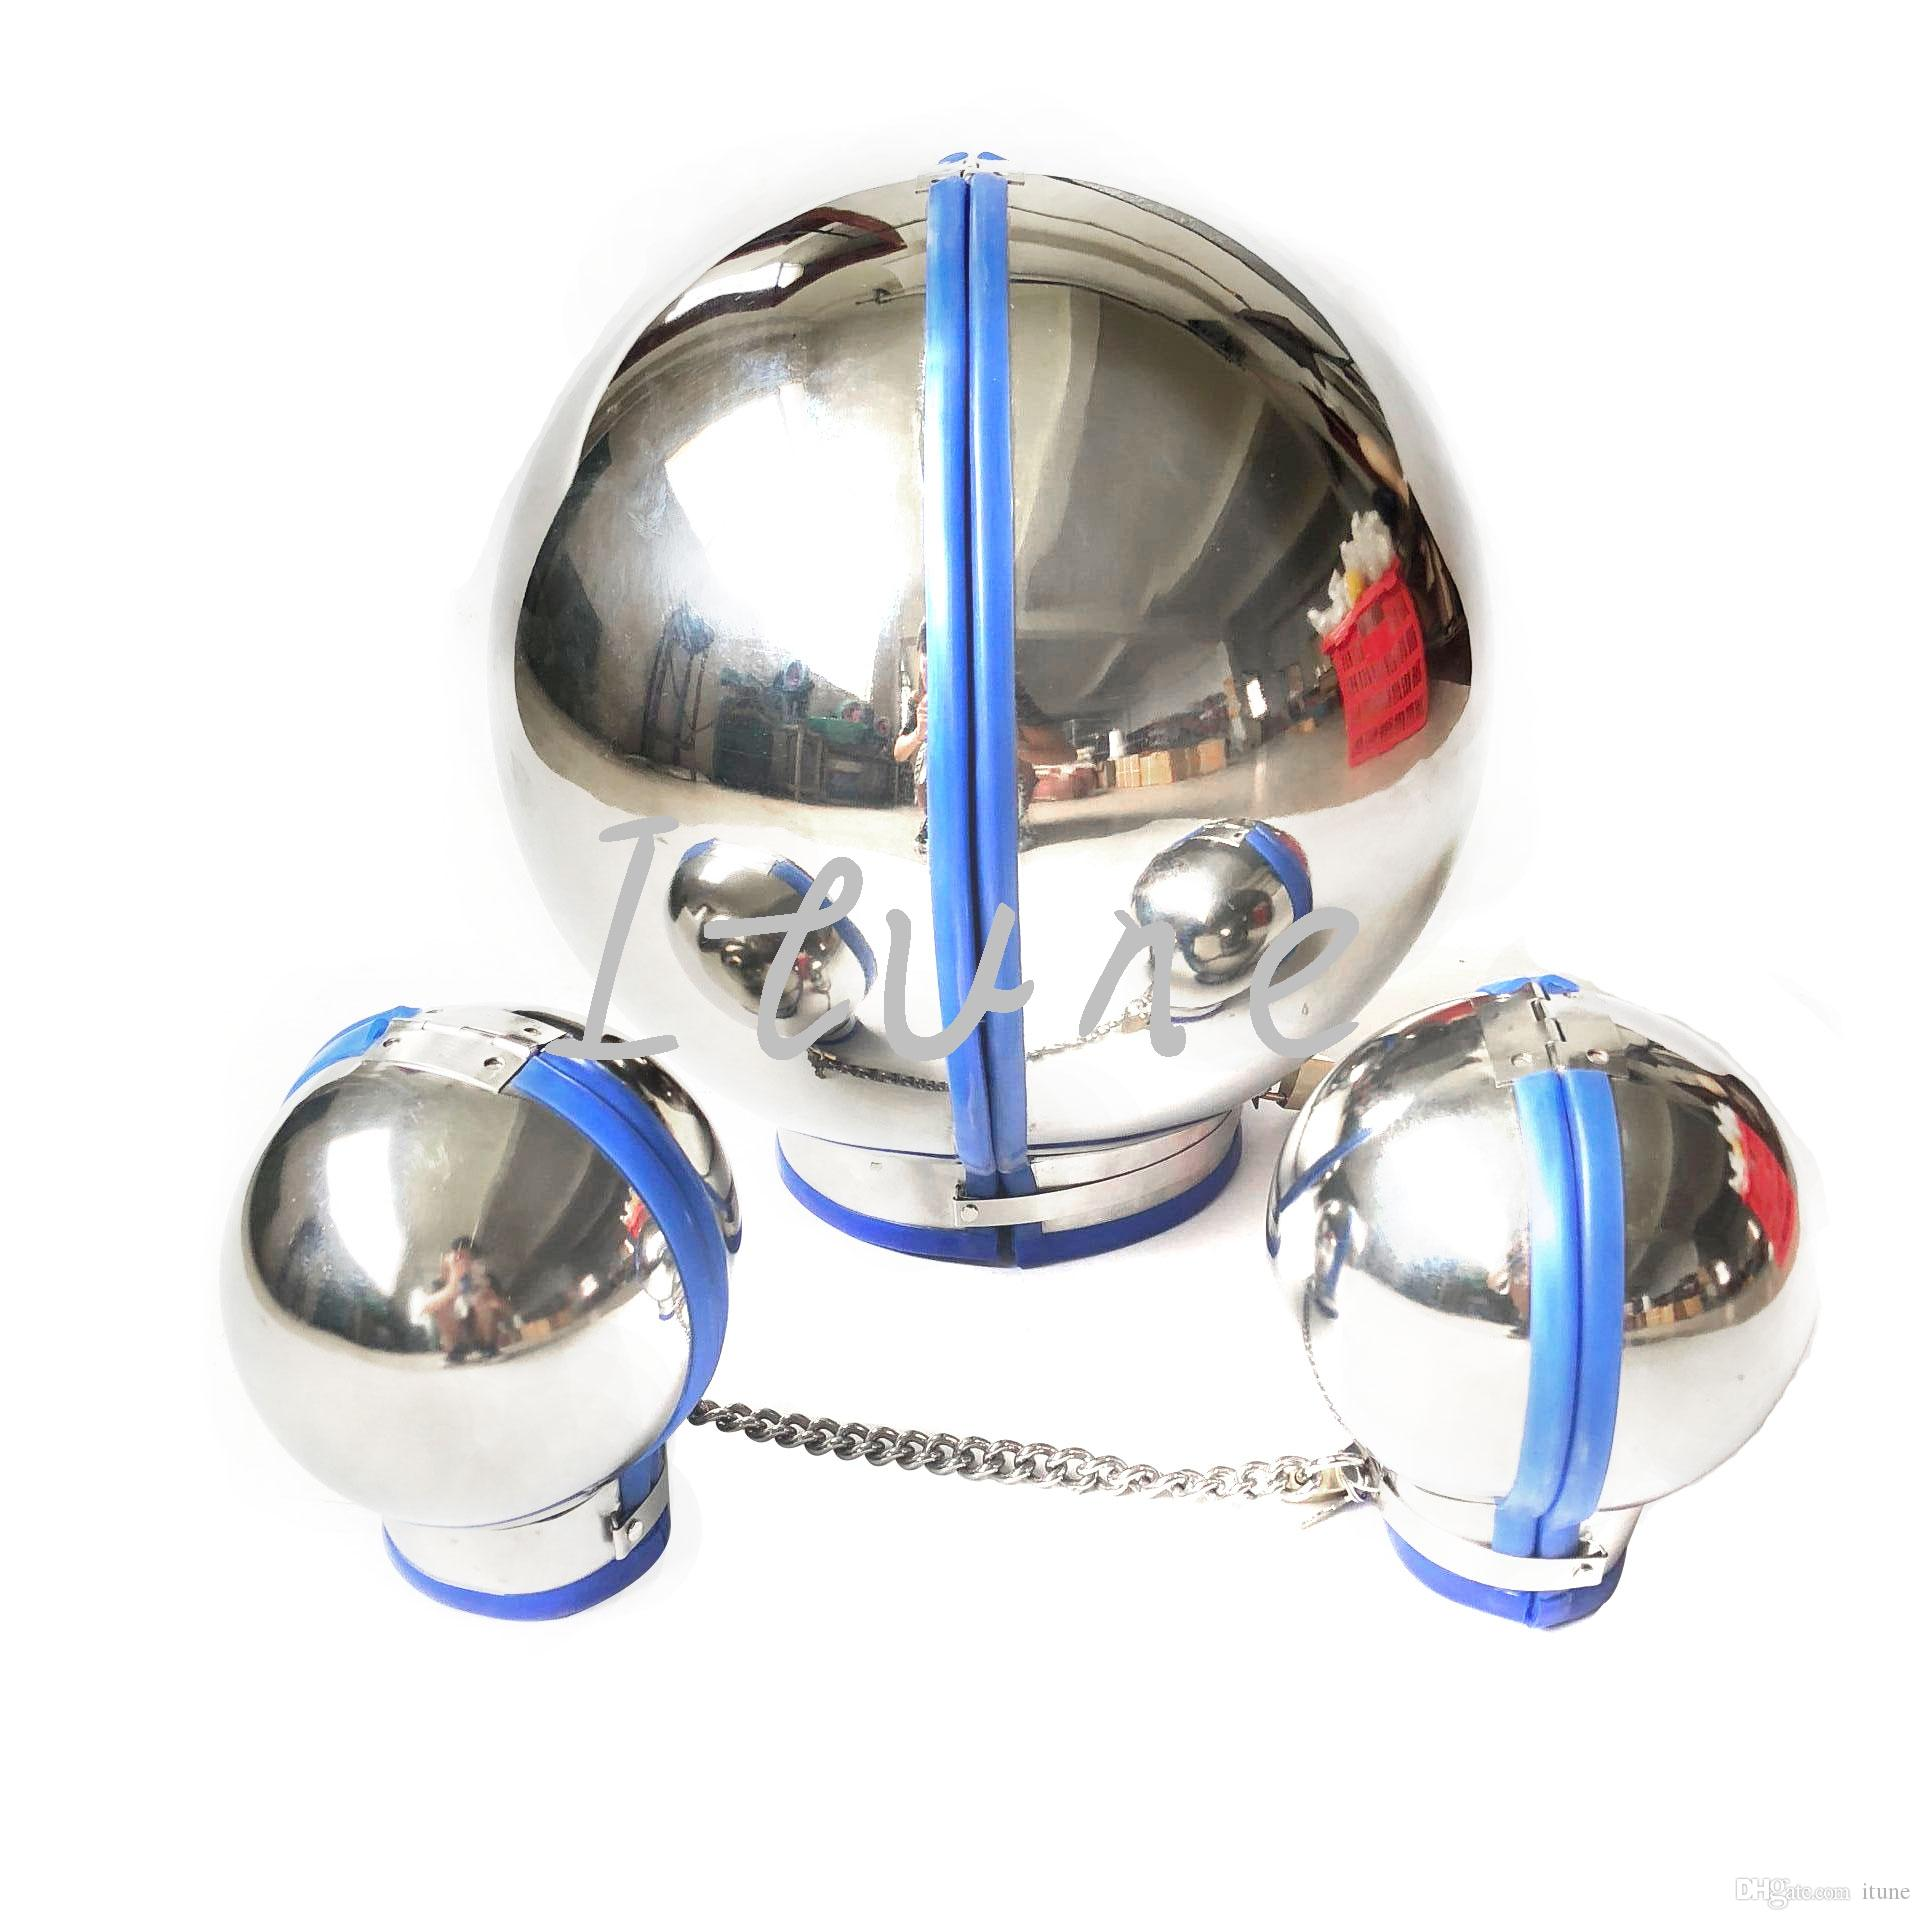 3pcs/lot/set Unisex Stainless Steel Dog Slave Ball Headgear Head Cover Handcuffs Wrist Restraint Bondage BDSM Adult Sex Toy for Male Female